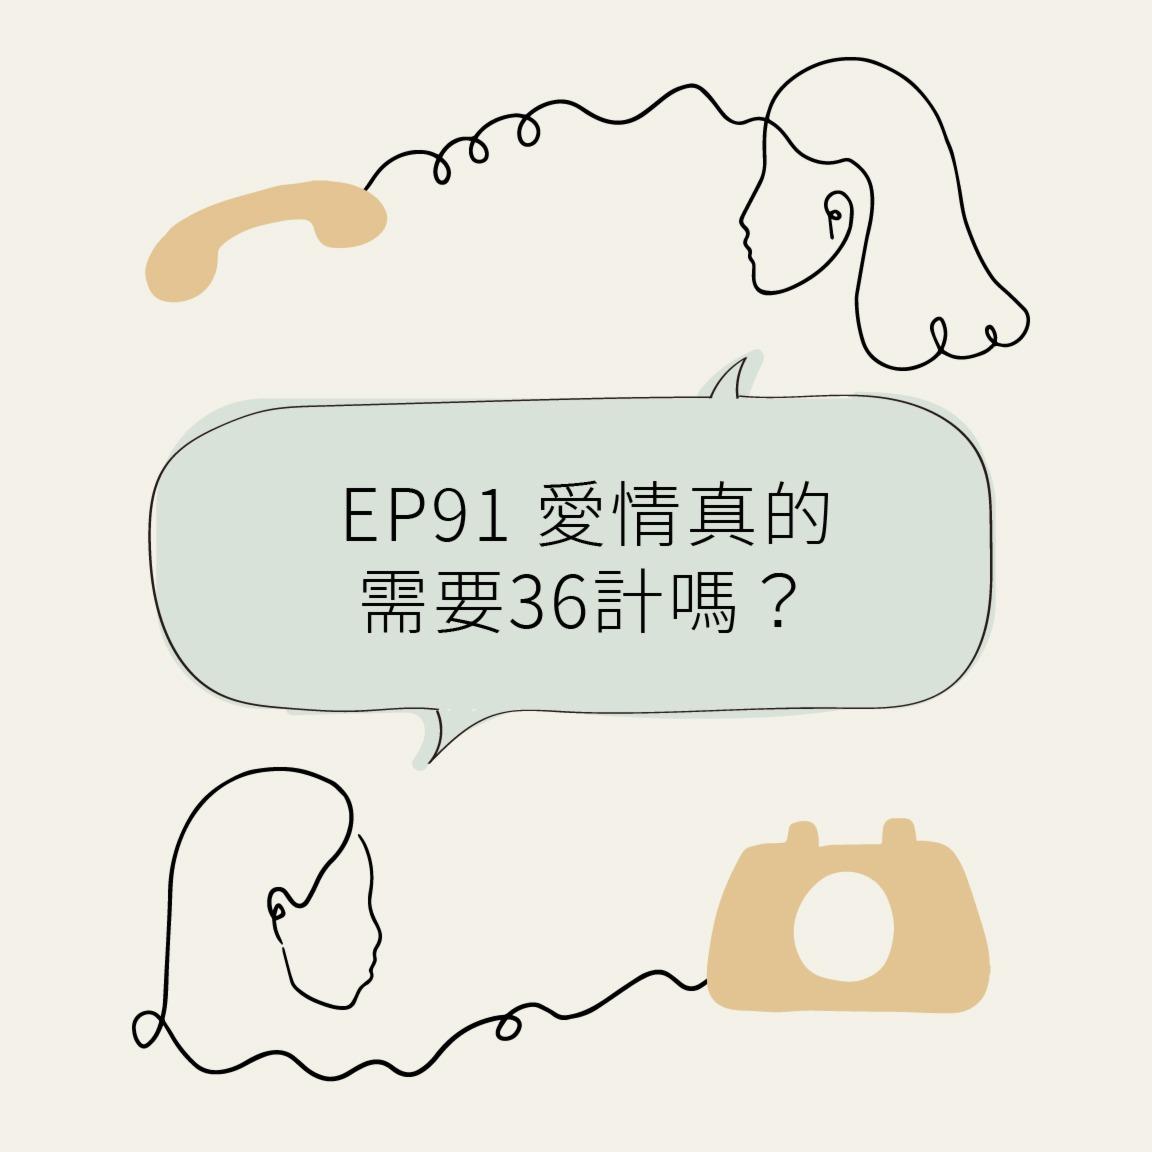 EP91 爱情真的需要36计吗?